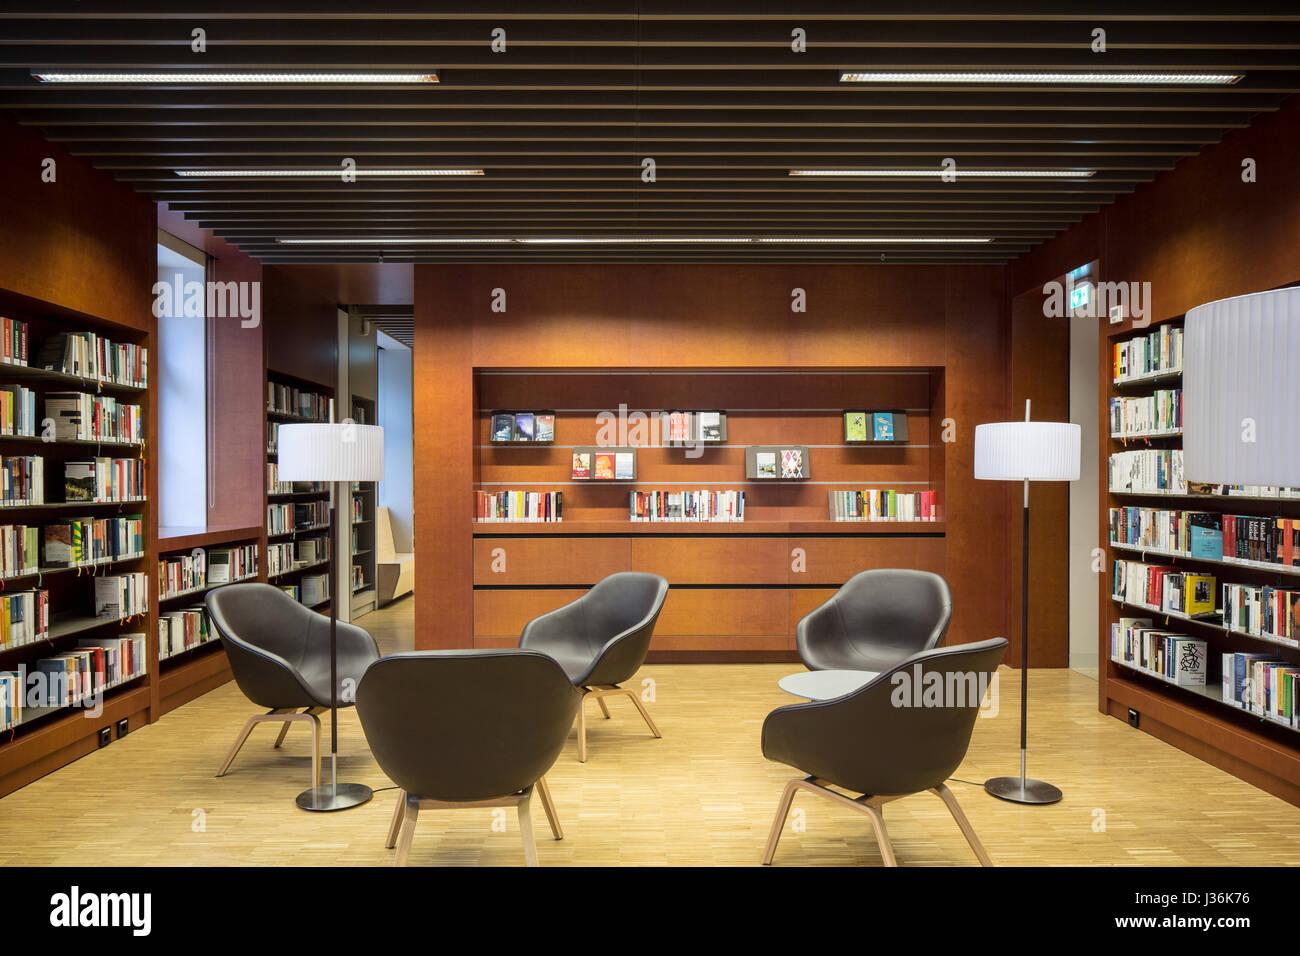 Private reading room with bookshelves. Haus der Bildung - Municipal Library Bonn, Bonn, Germany. Architect:  kleyer.koblitz.letzel.freivogel.architekt - Stock Image